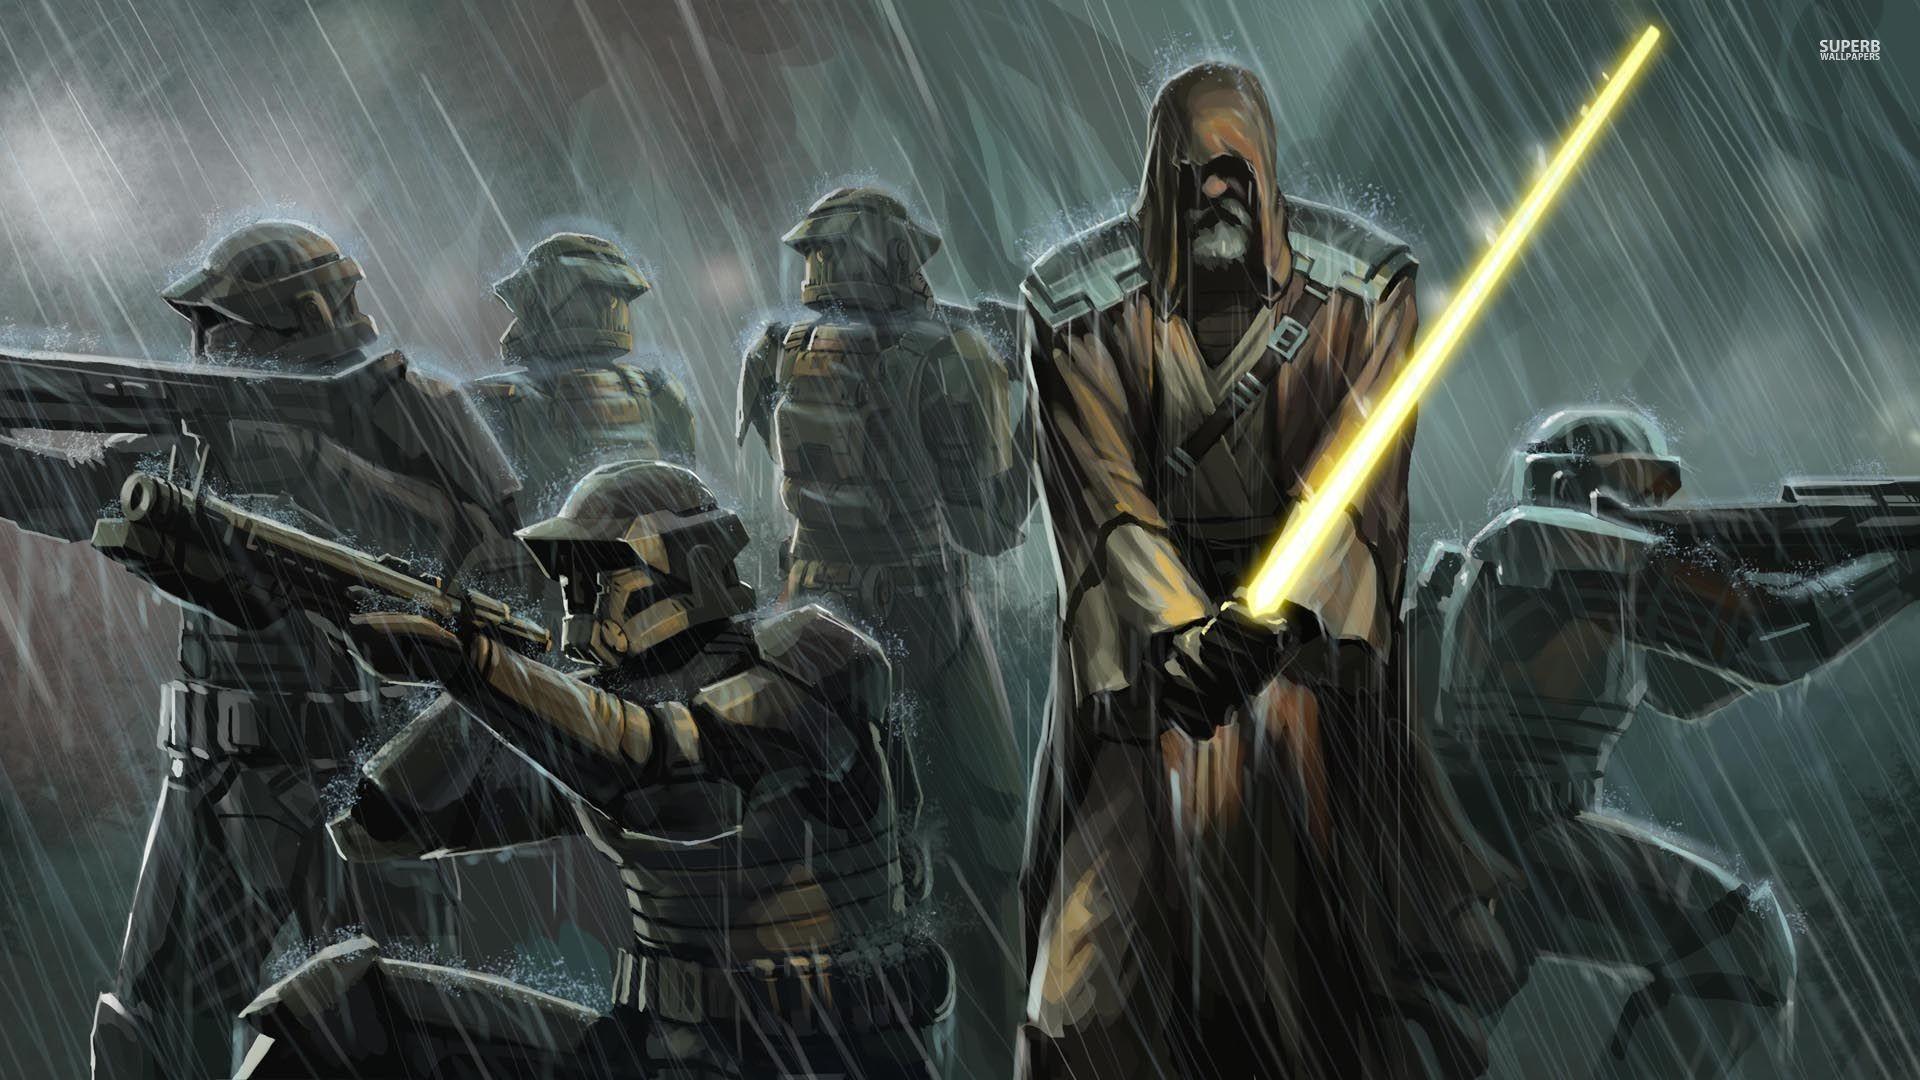 Stormtroopers Stormtrooper Star Wars Episode V – The Empire .